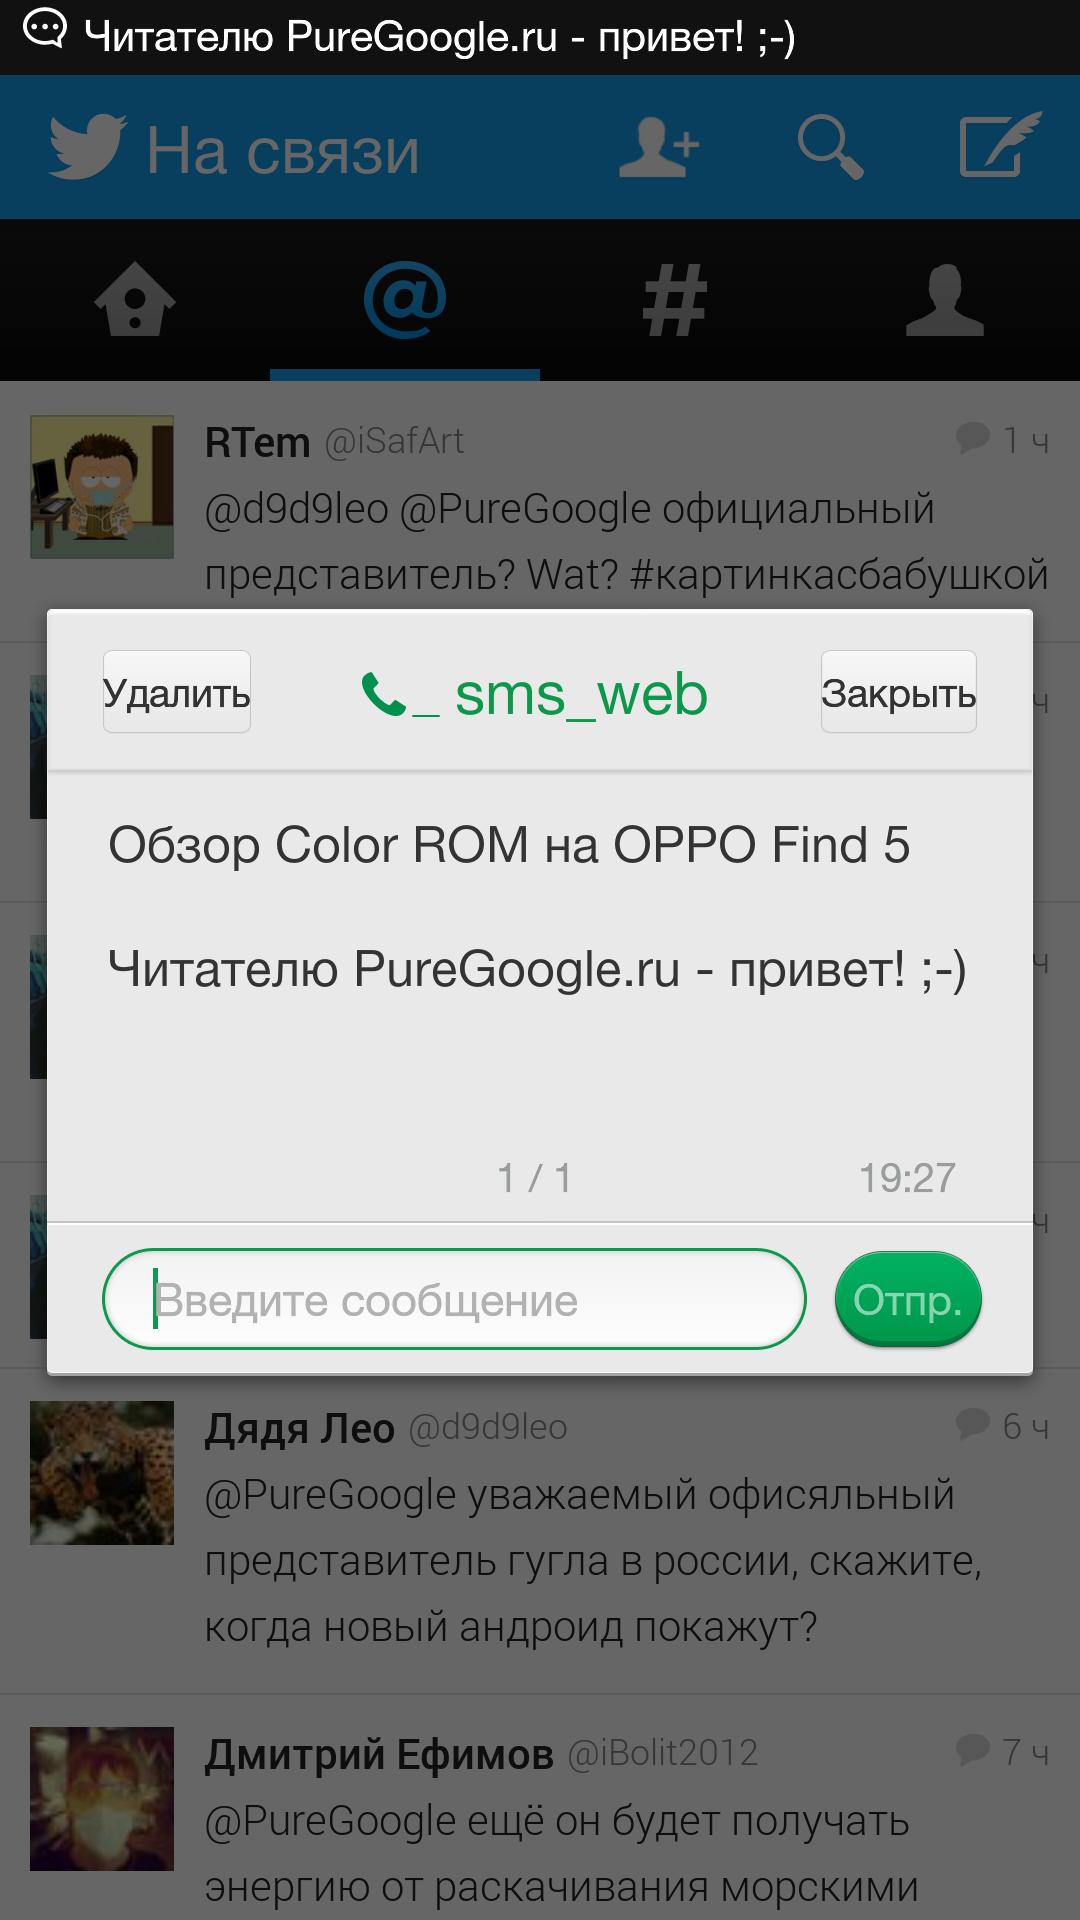 Screenshot_2013-10-26-19-28-02